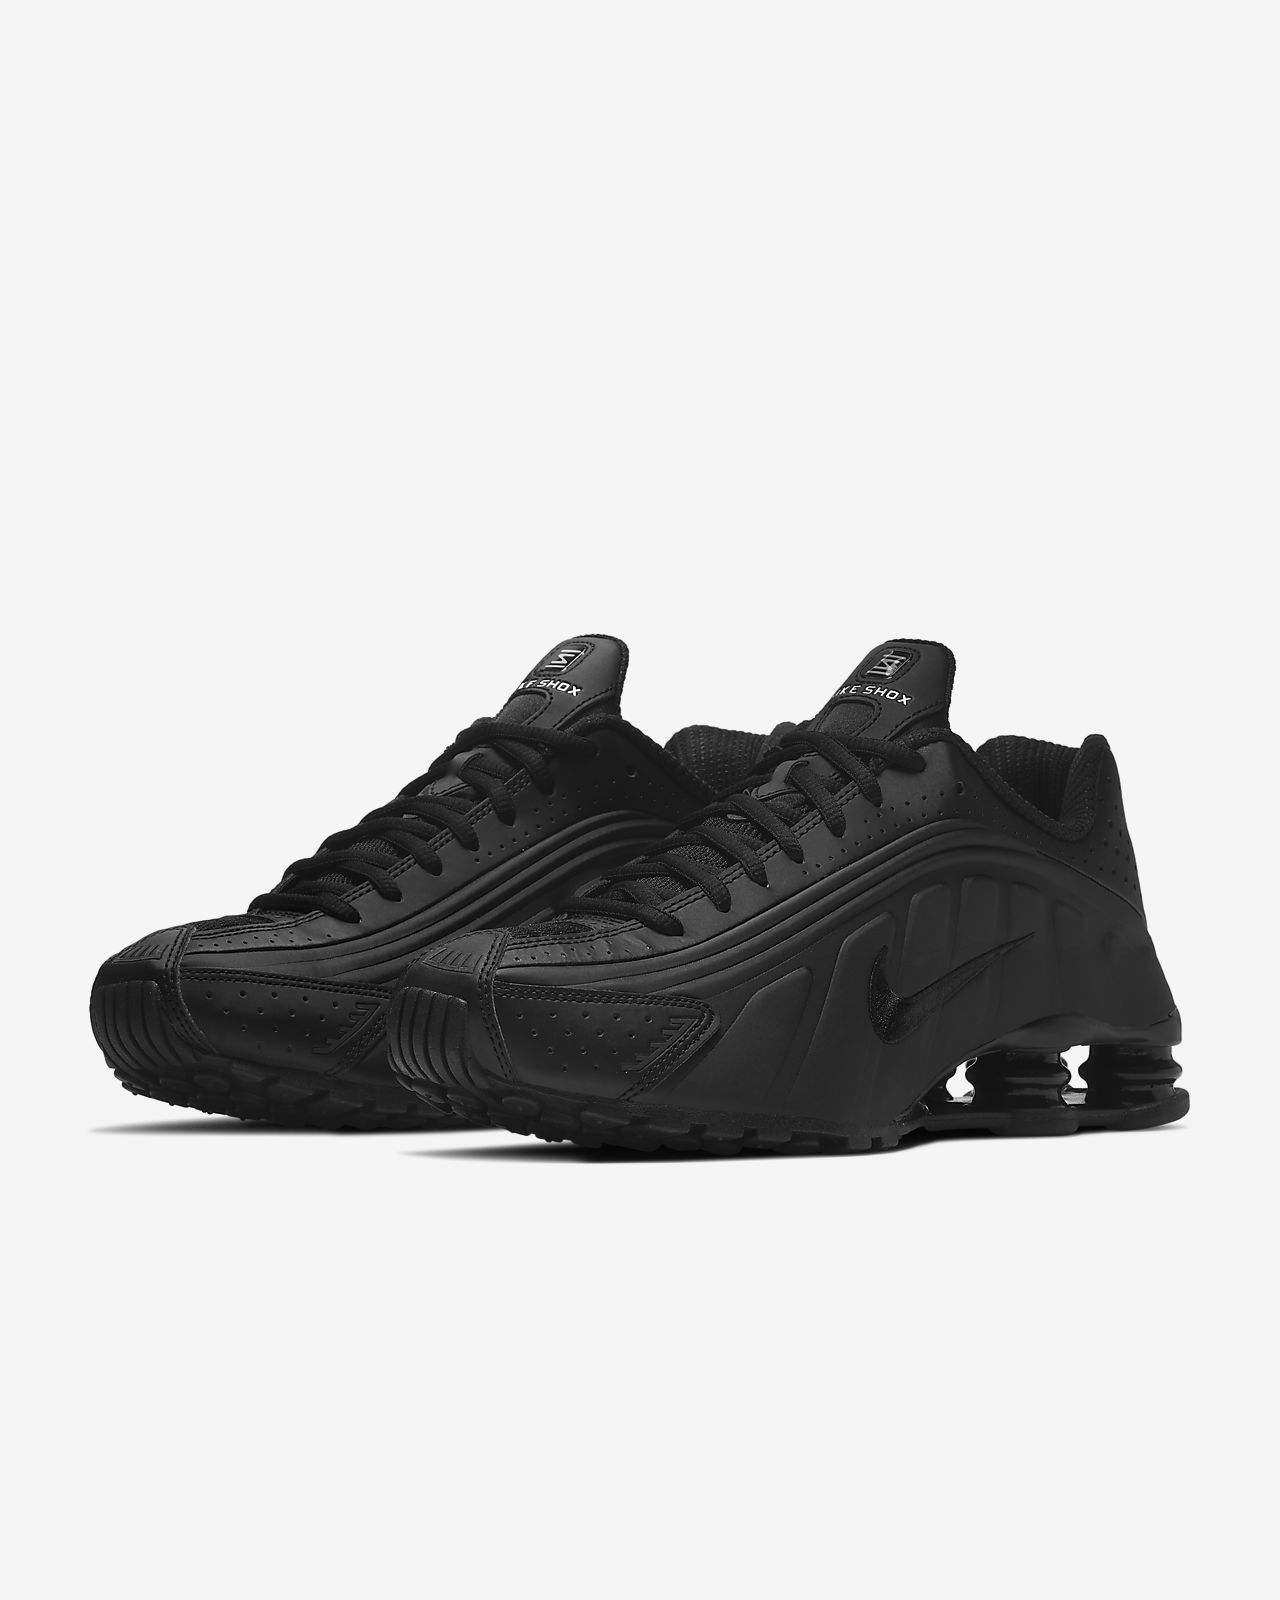 new concept 6ca46 505a3 ... Calzado para hombre Nike Shox R4